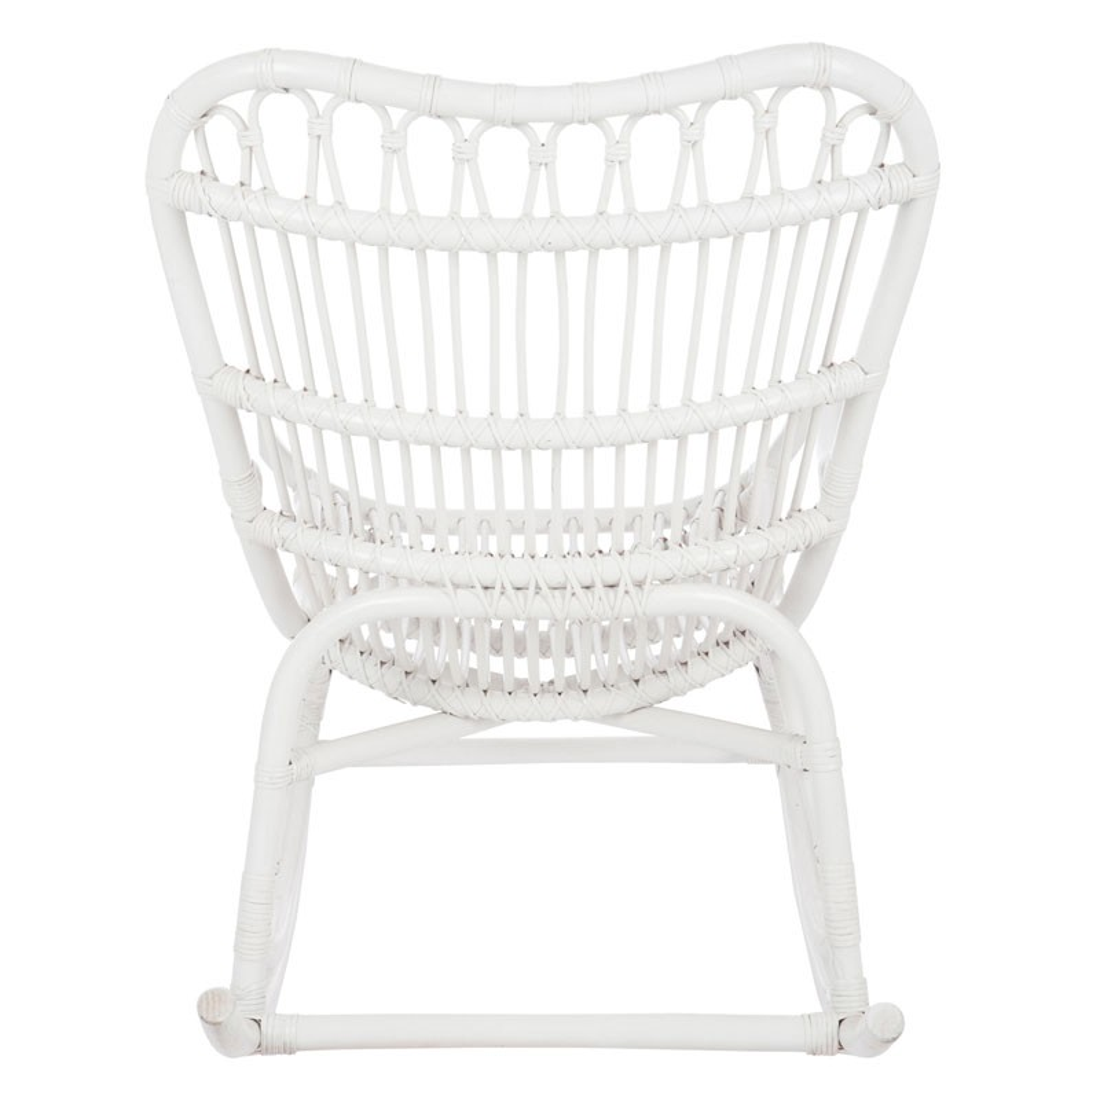 rocking chair en rotin blanc rotin marron clair et blanc l vrifier la with rocking chair en. Black Bedroom Furniture Sets. Home Design Ideas